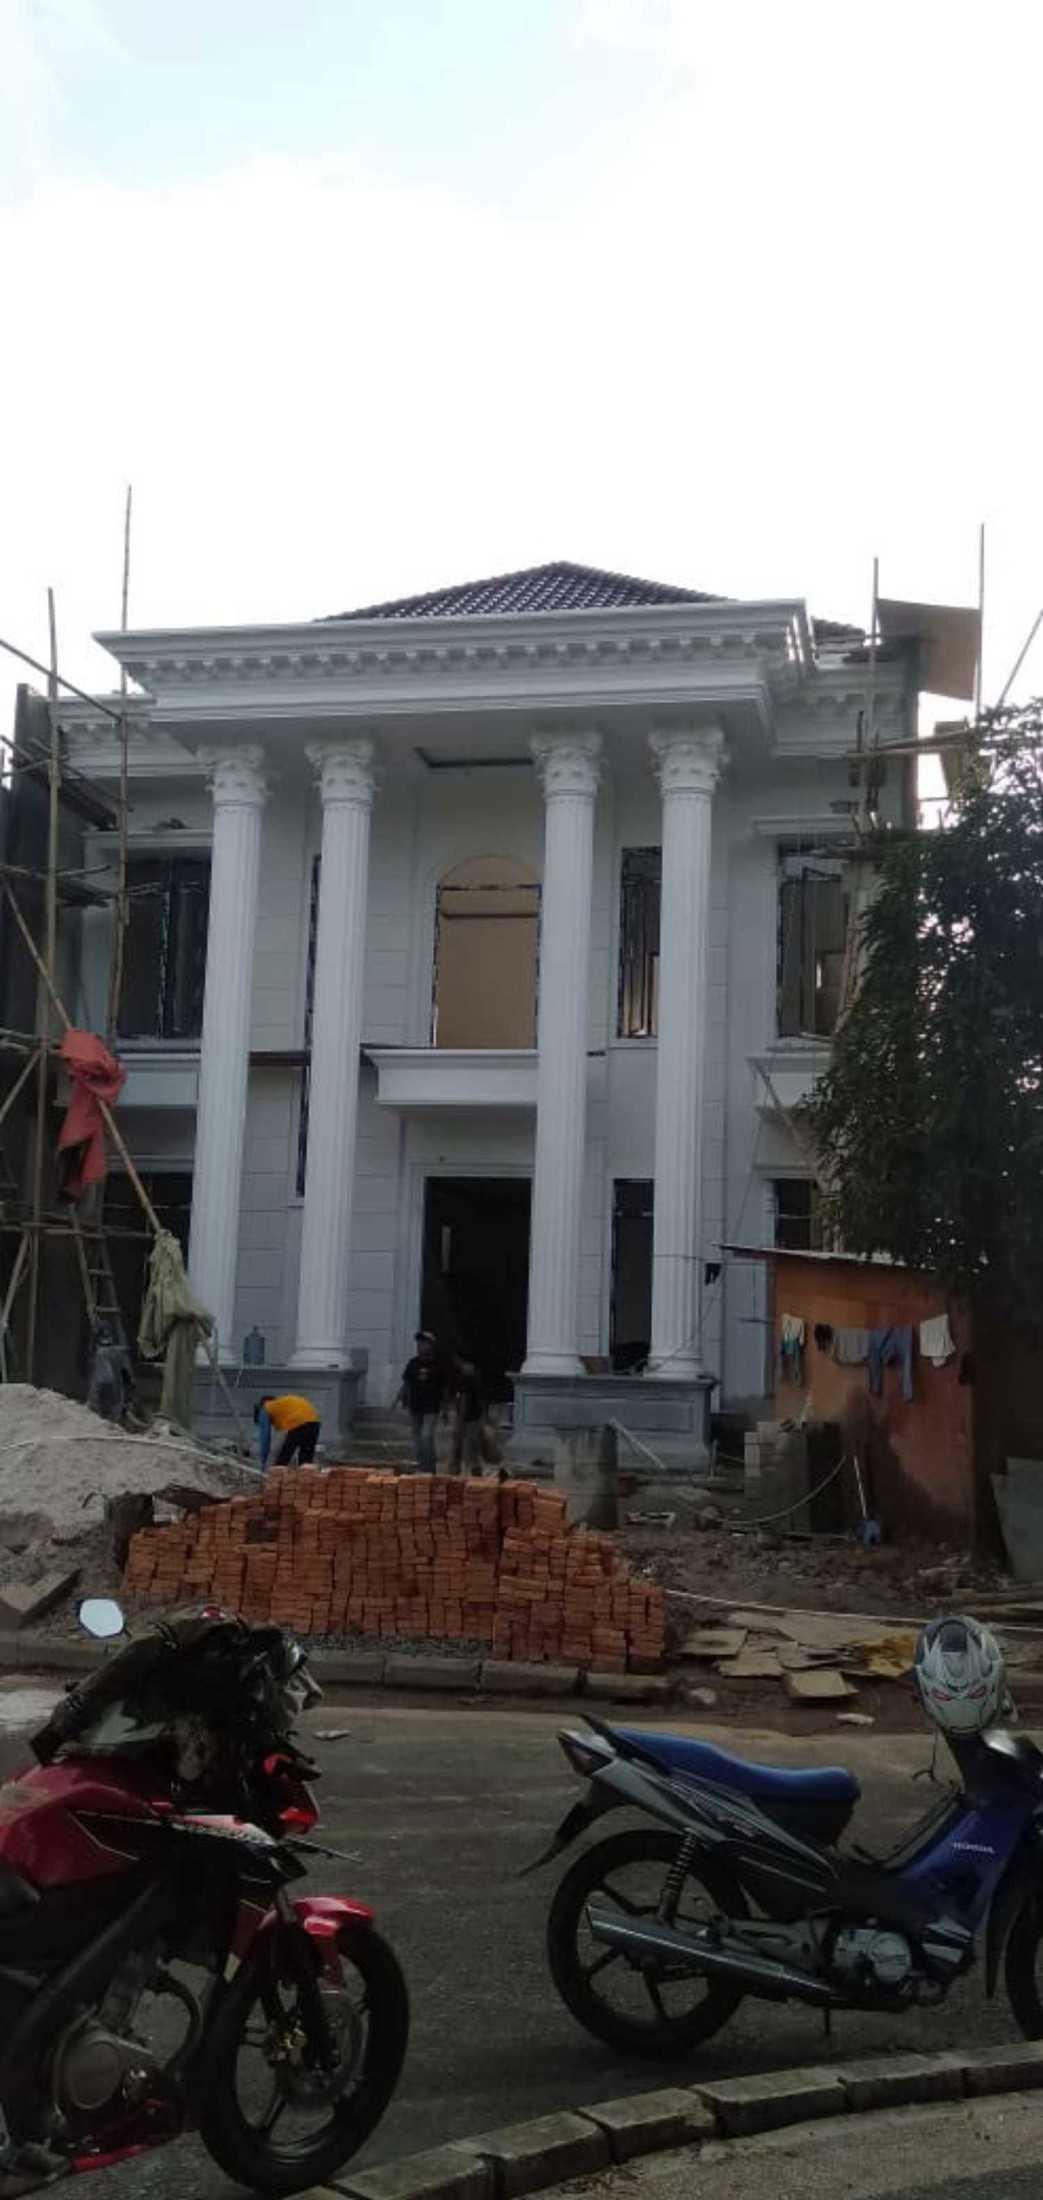 Vanproject Rumah Clasik Modern Cisarua, Kec. Cisarua, Bogor, Jawa Barat, Indonesia Cisarua, Kec. Cisarua, Bogor, Jawa Barat, Indonesia Vanproject-Rumah-Clasik-Modern  132343